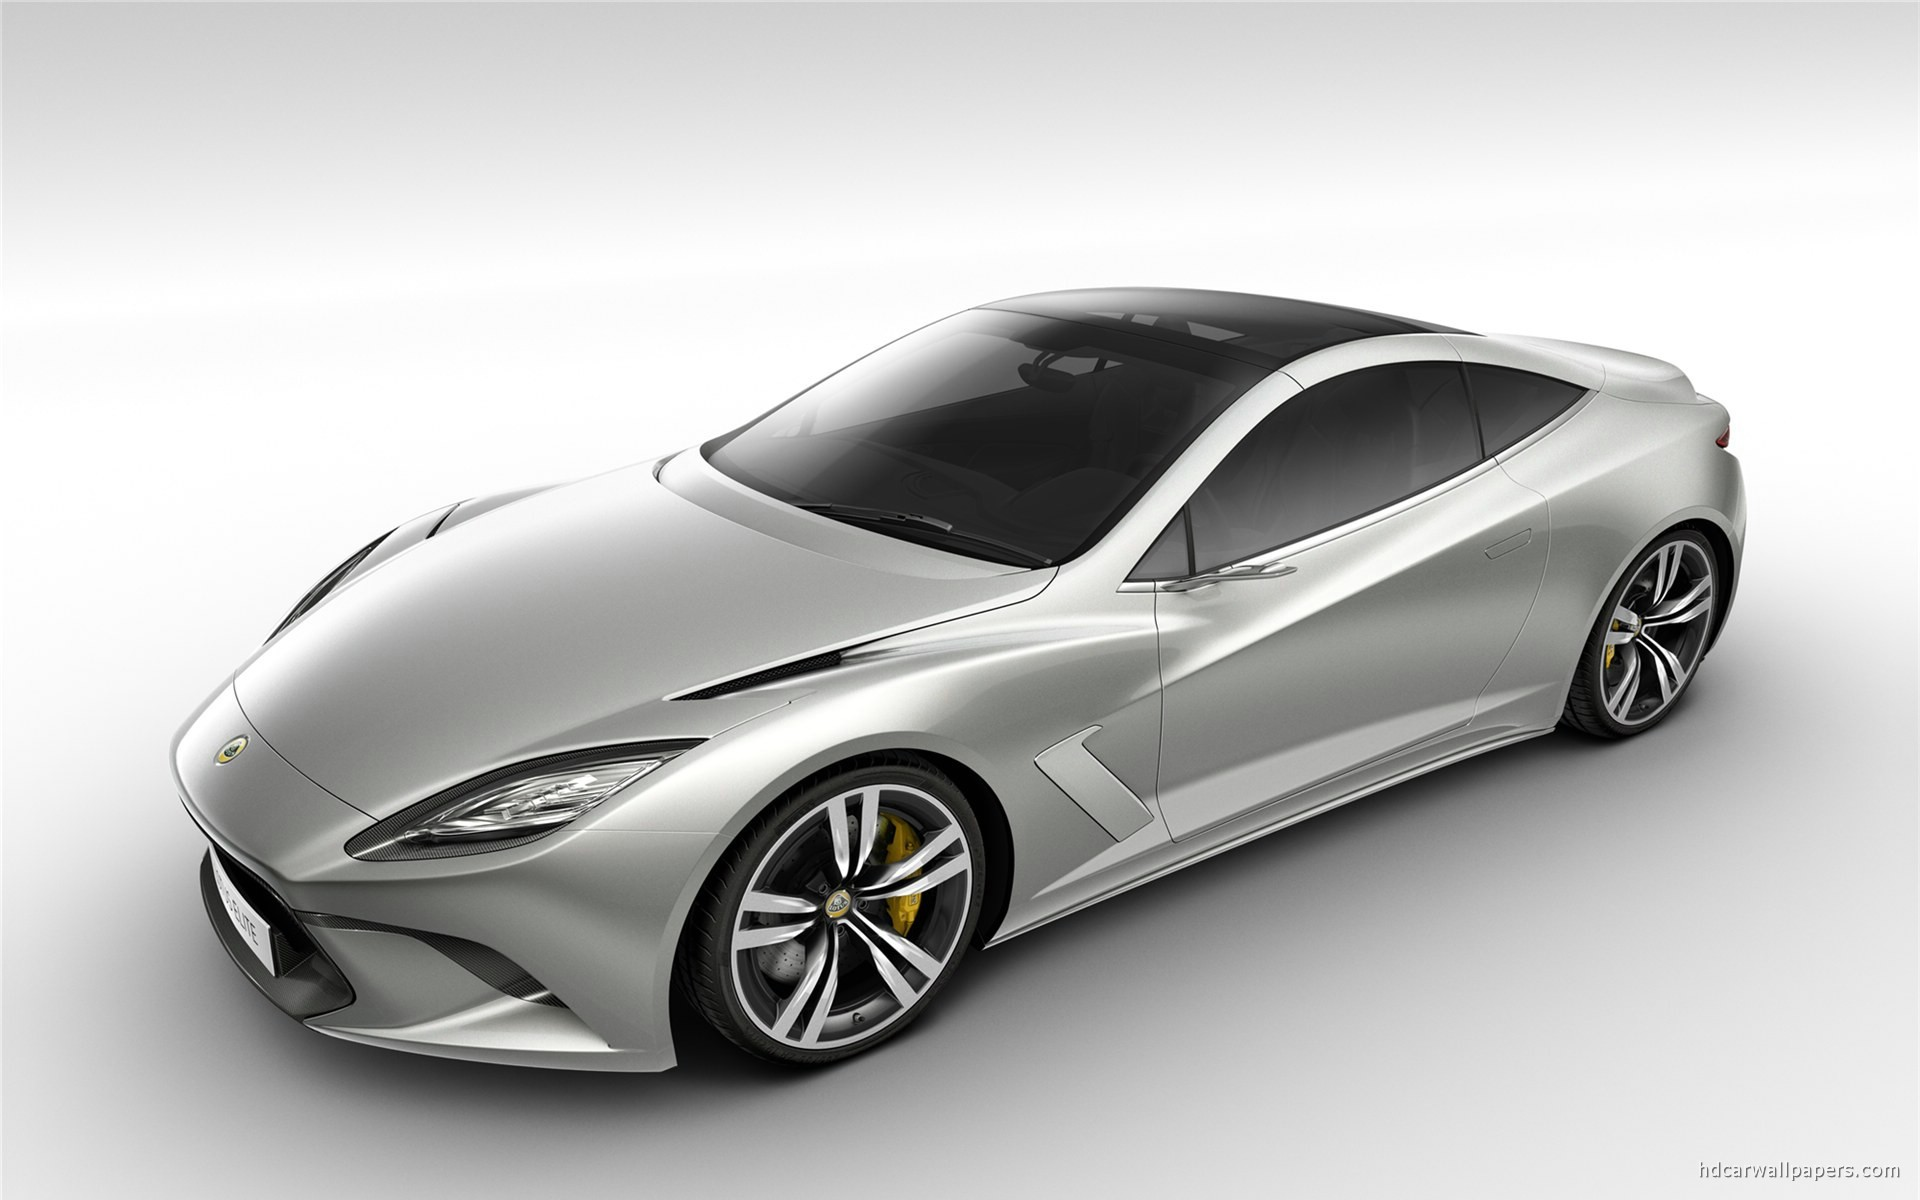 Elite Motor Cars: 2010 Lotus Elite Concept Wallpaper